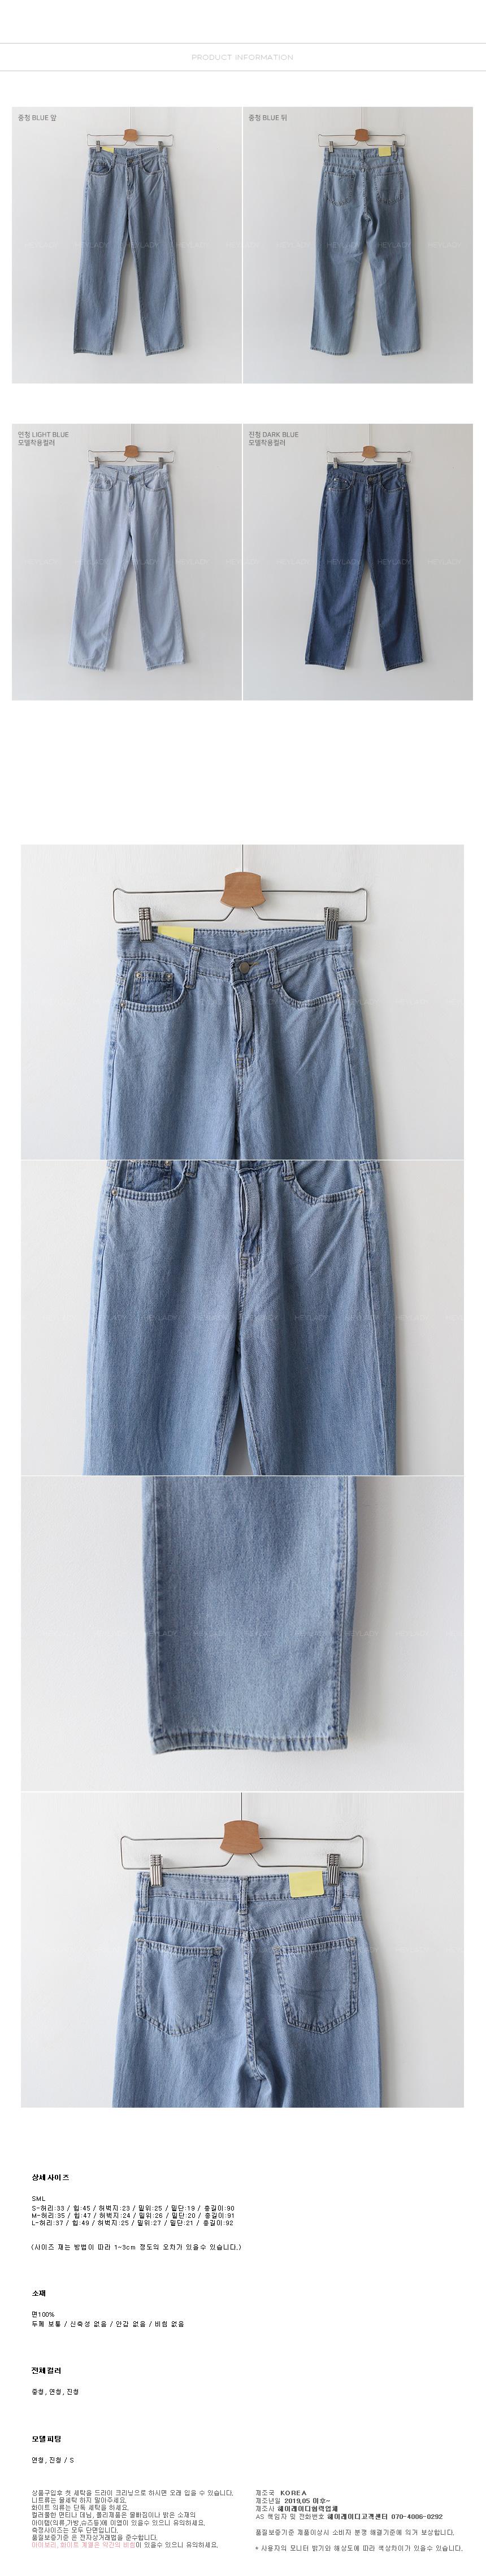 Yard wide denim pants